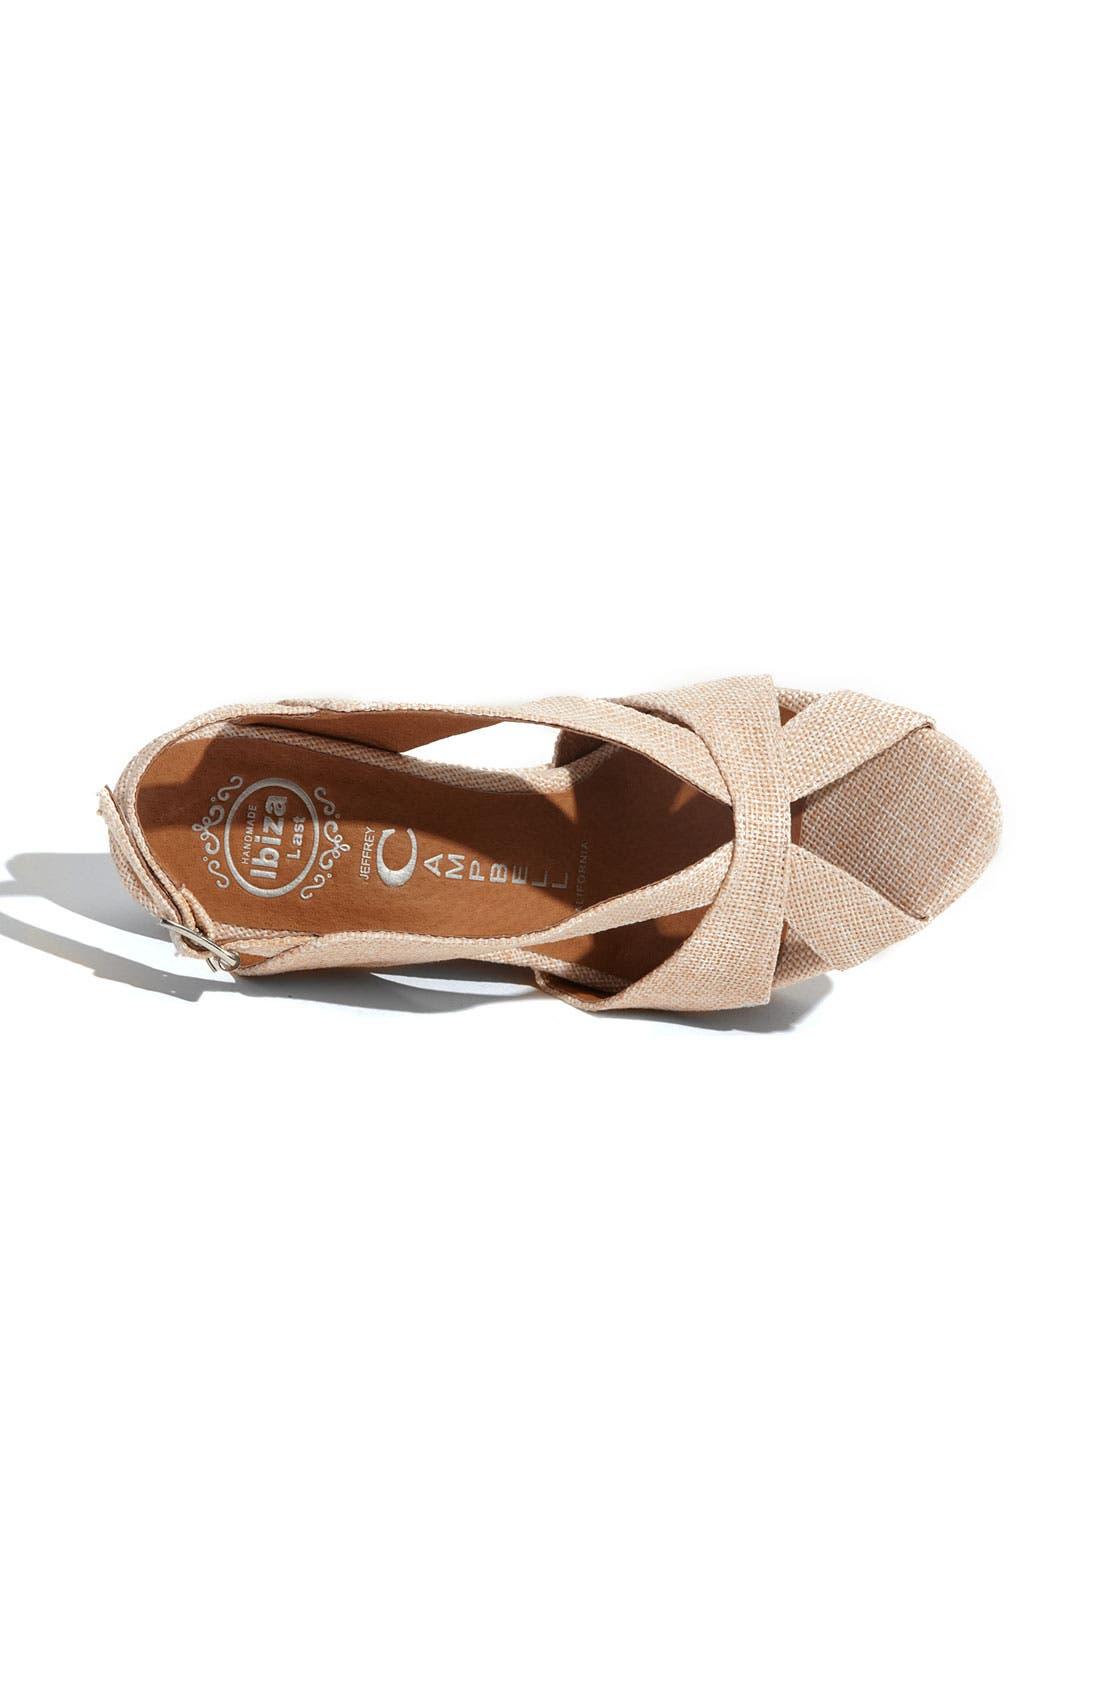 Alternate Image 3  - Jeffrey Campbell 'Mariel' Wedge Sandal